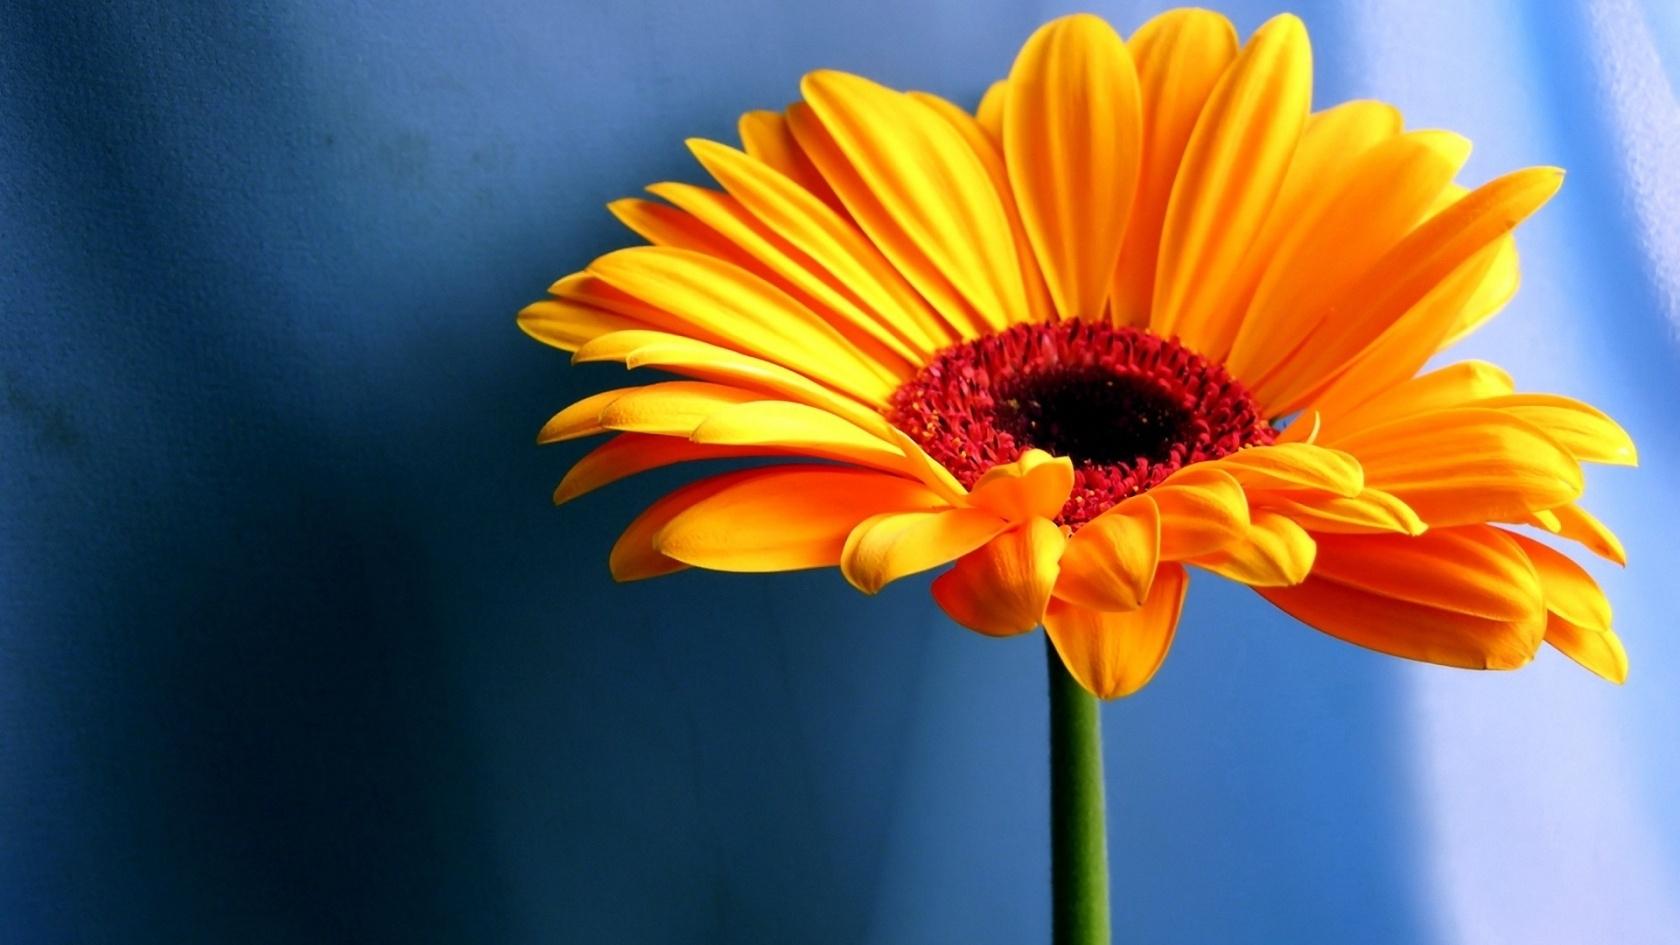 download free flower desktop backgrounds hd images flowers afari of